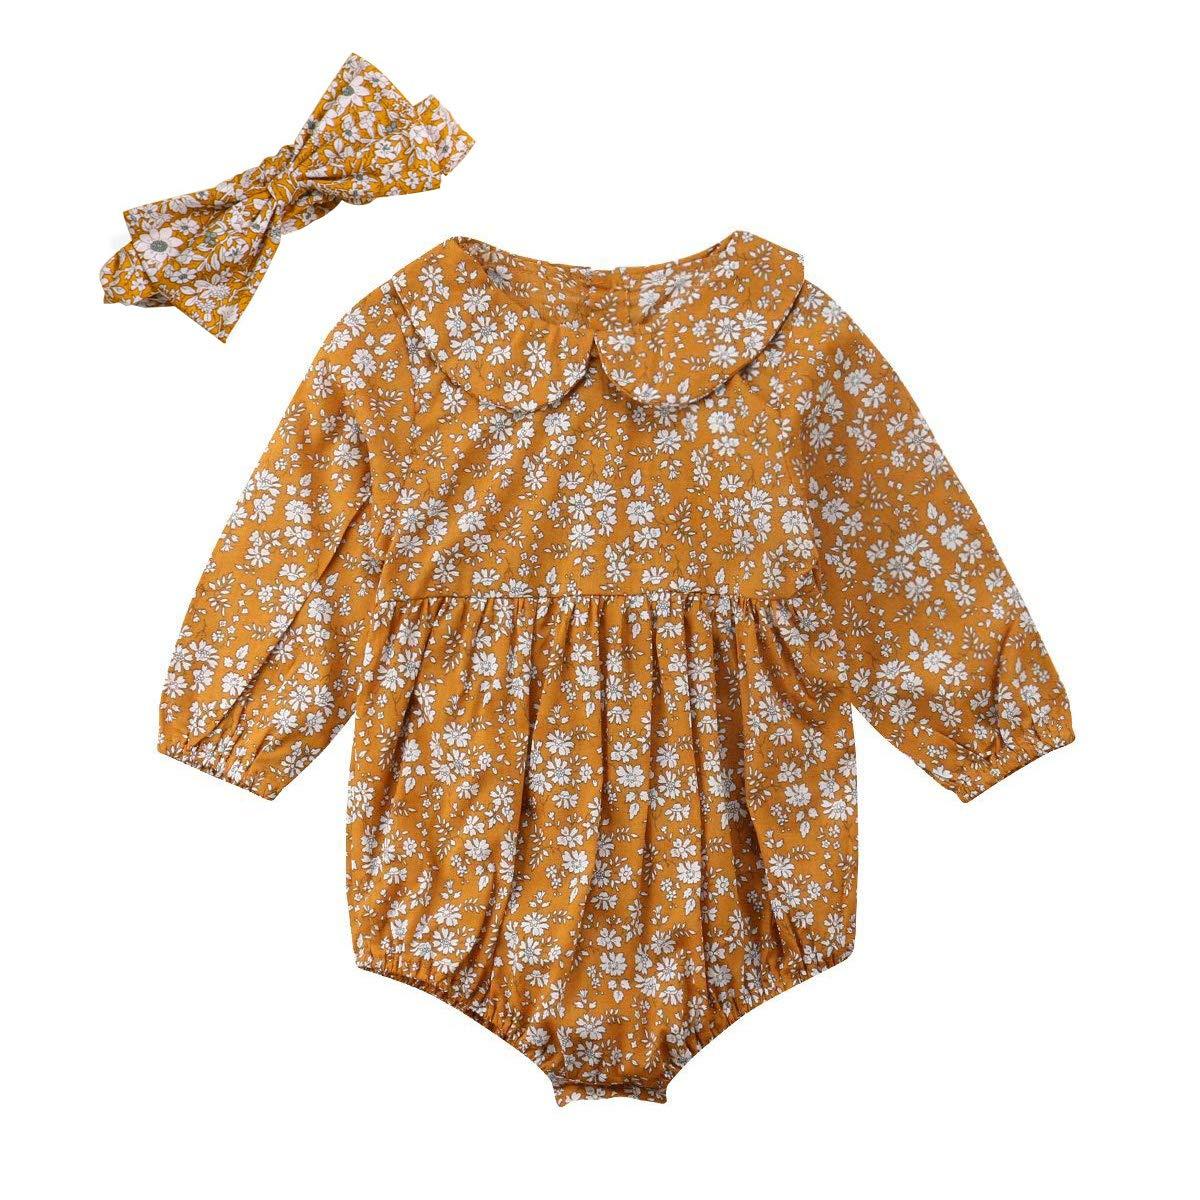 0964d3a94 Amazon.com  Newborn Baby Girls 3 6 12 18 Months Floral Bodysuit Long ...